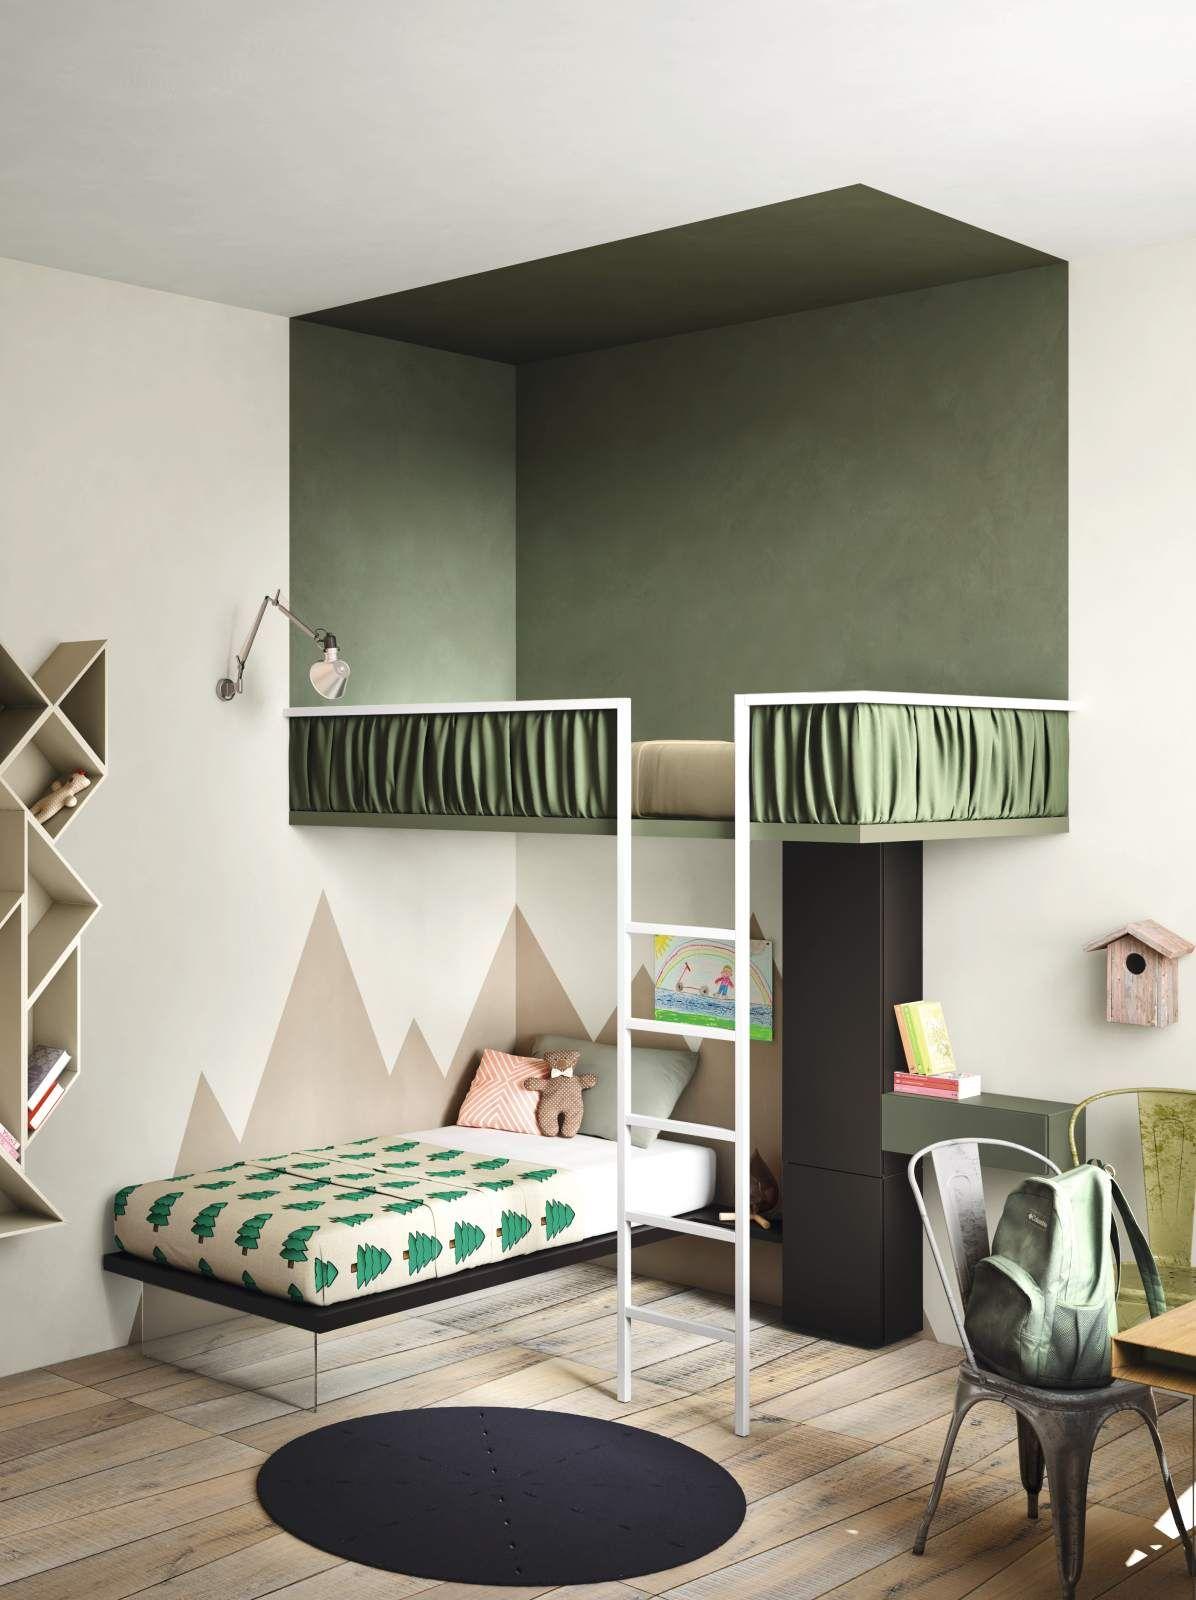 Loft bed ideas for boys  New Kids u Young Catalogue  Kids Bedroom u Nursery Ideas